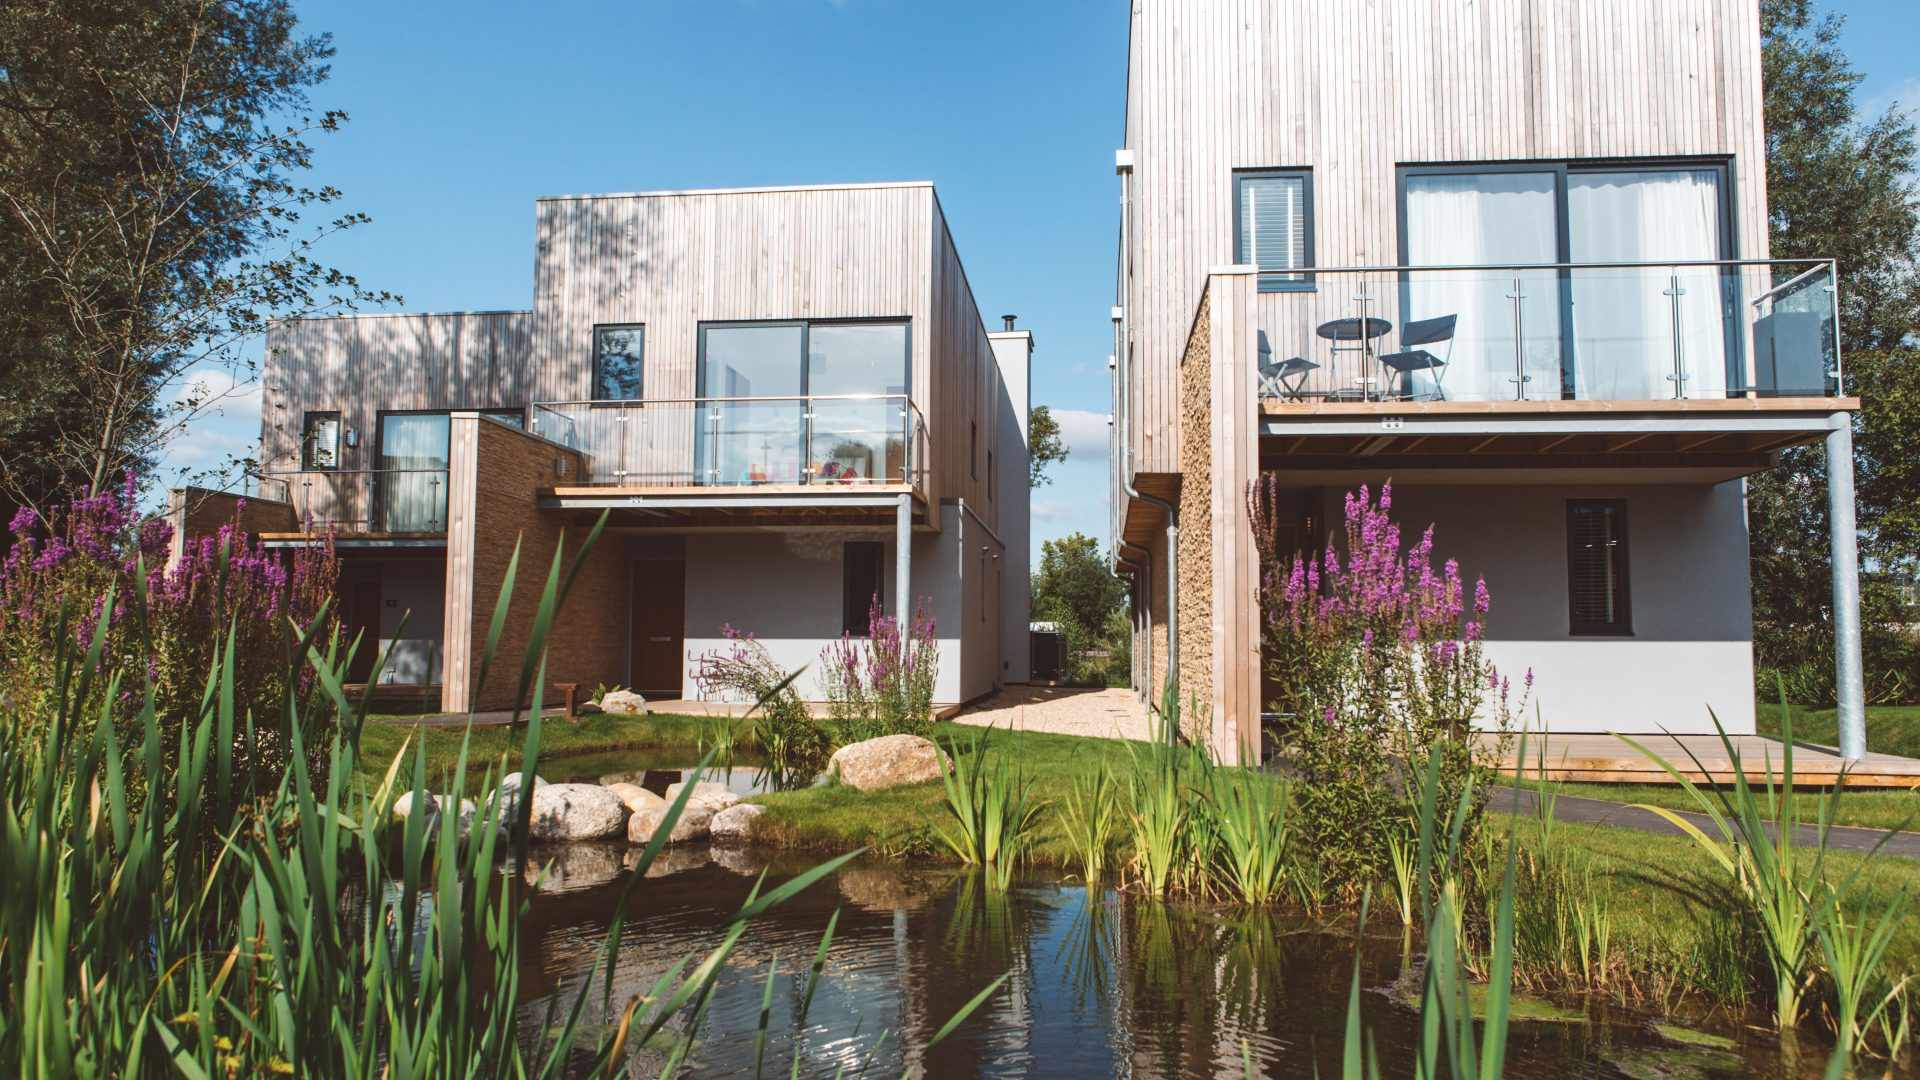 Habitat Escapes in the Cotswolds: A luxury lakeside break?